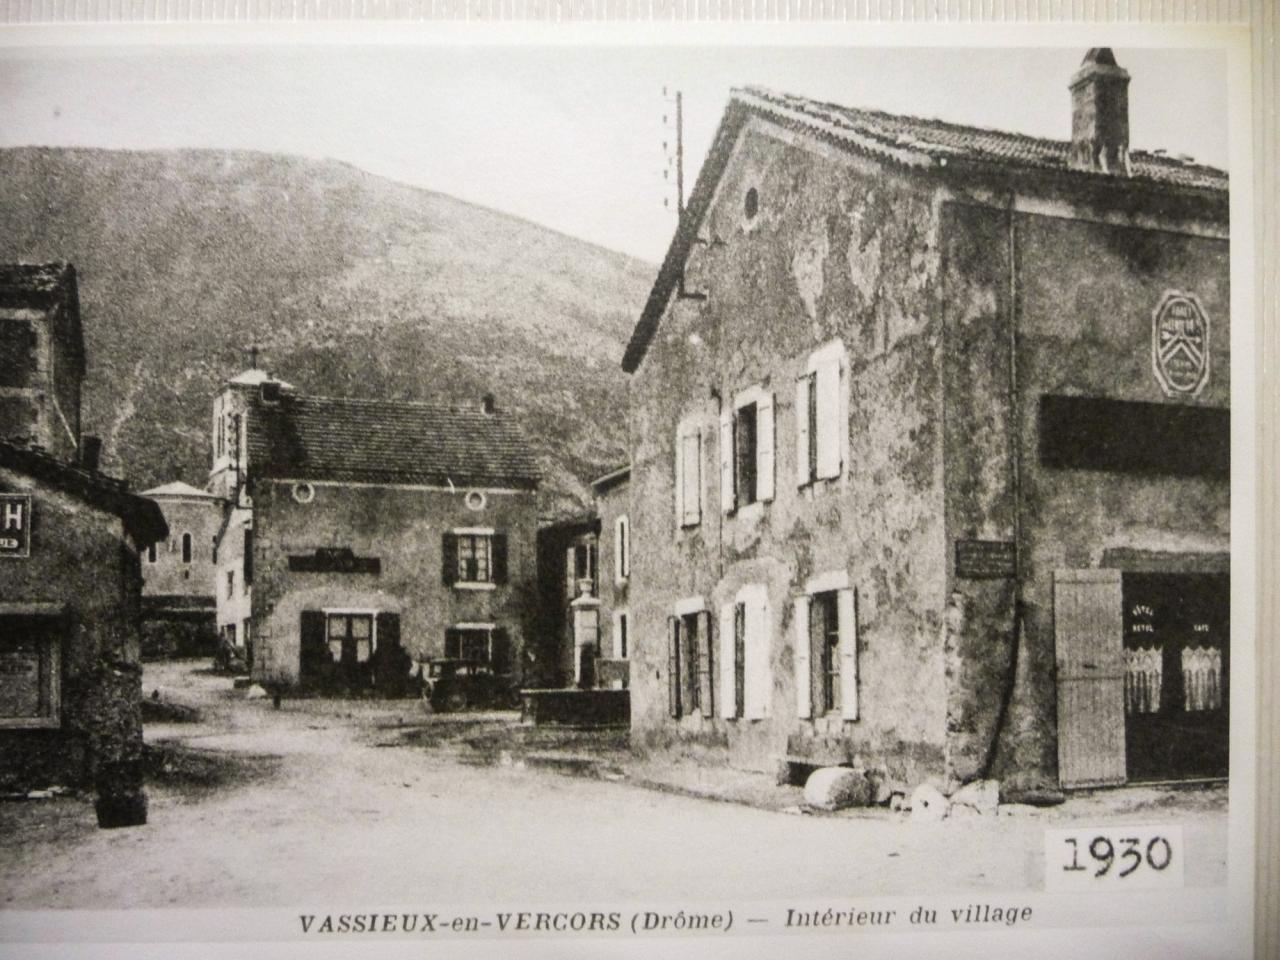 Vassieux